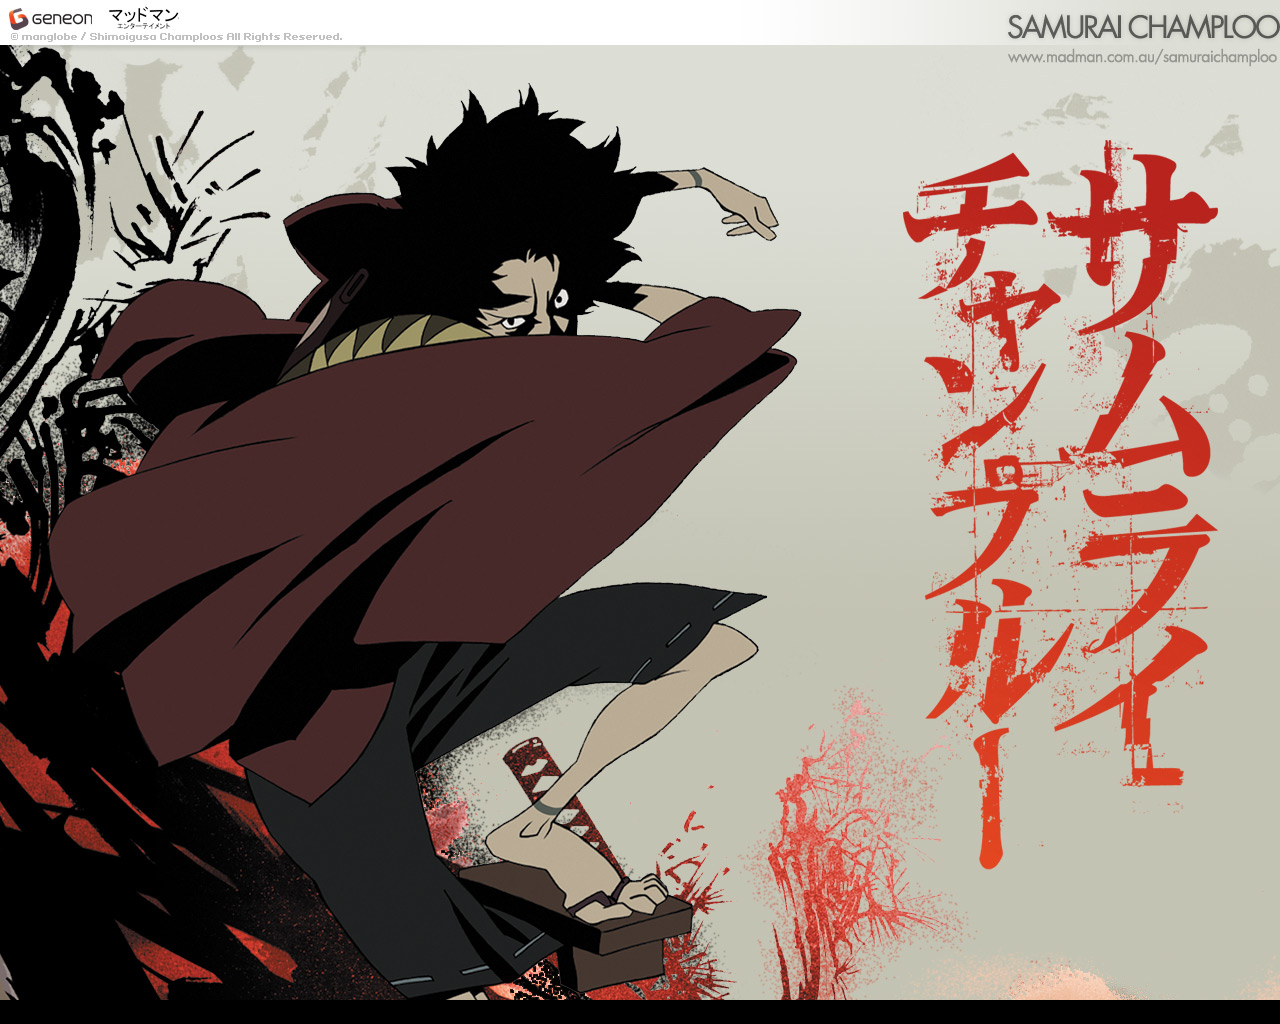 samurai_champloo_01_1280.jpg